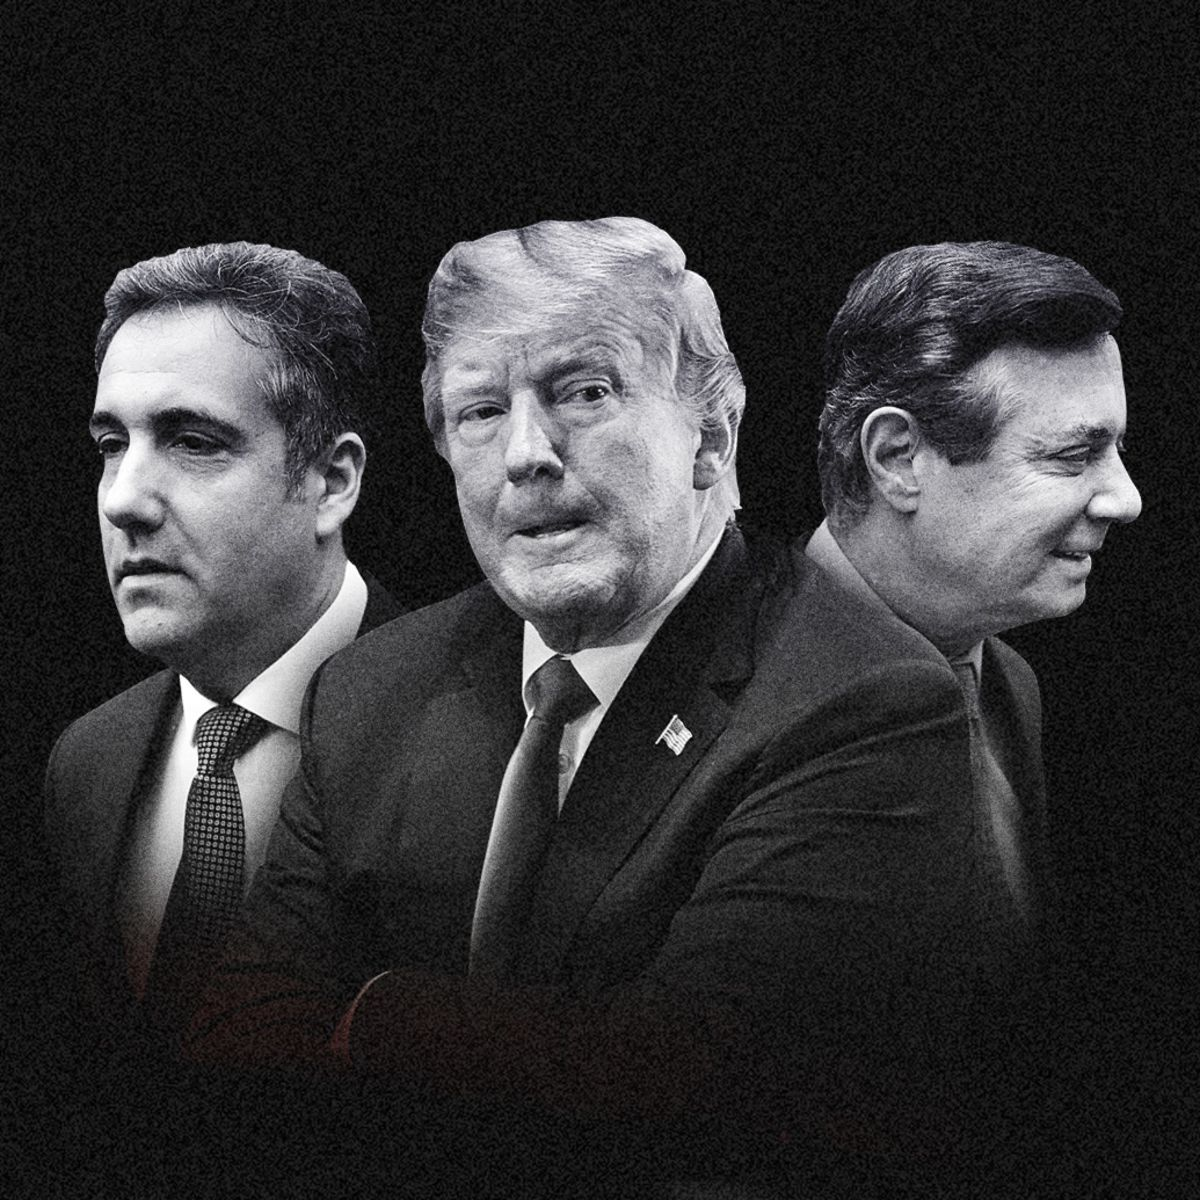 Can Trump Pardon Cohen Manafort Or Himself Bloomberg Paket Murmer Acces Point Komplit